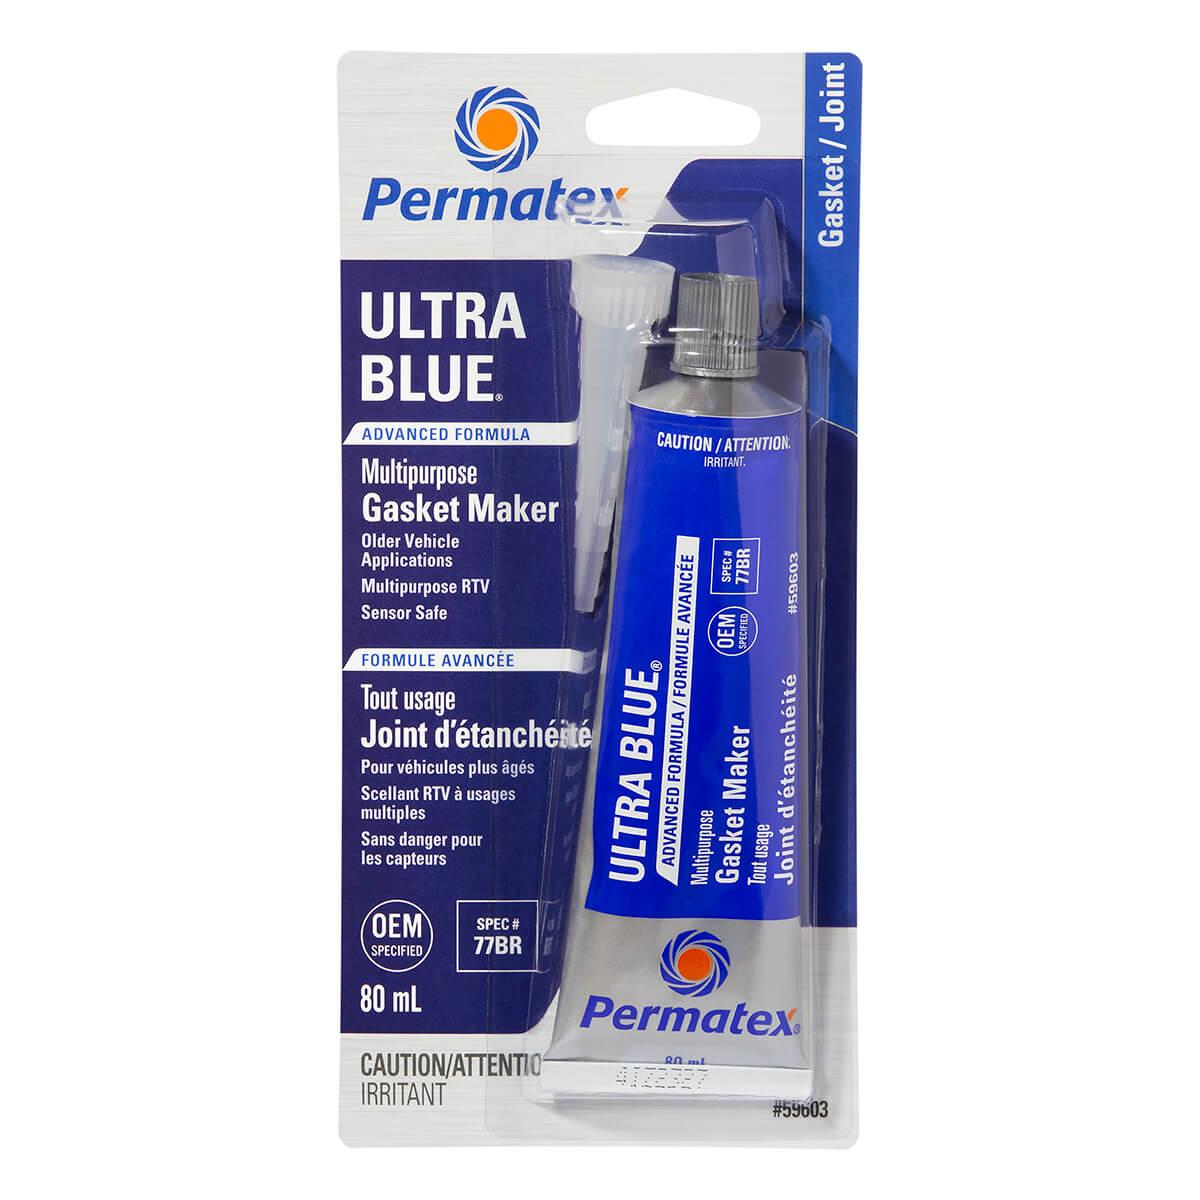 Permatex Ultra Blue Gasket Maker - 80 ml